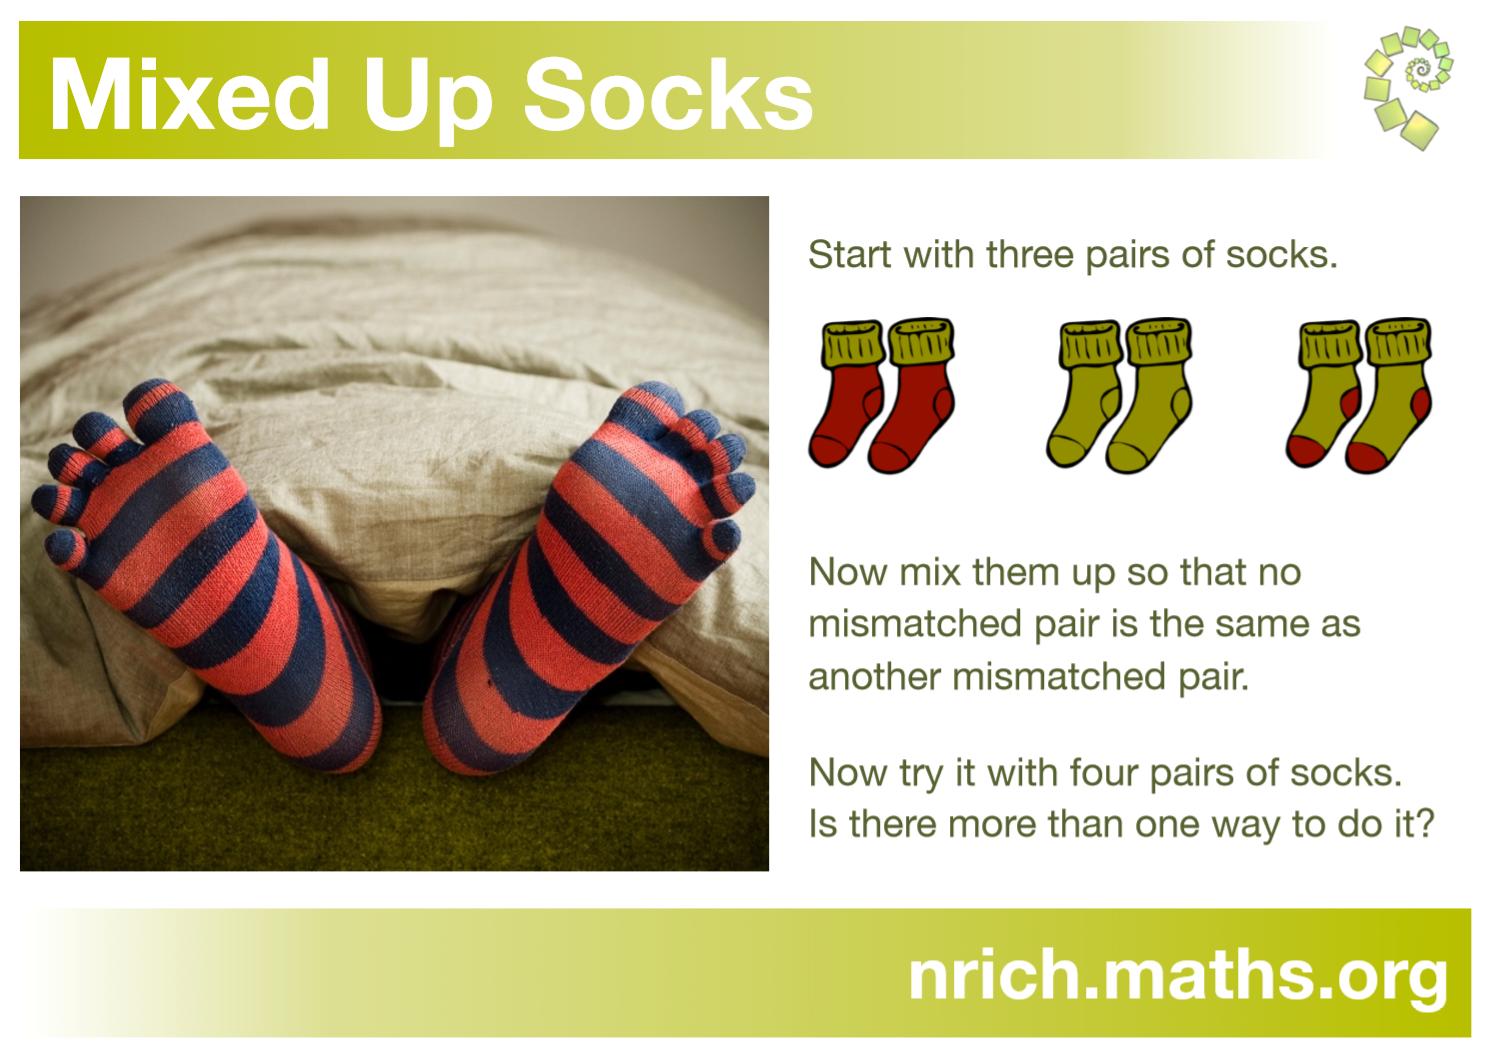 Mixed up Socks Poster : nrich.maths.org